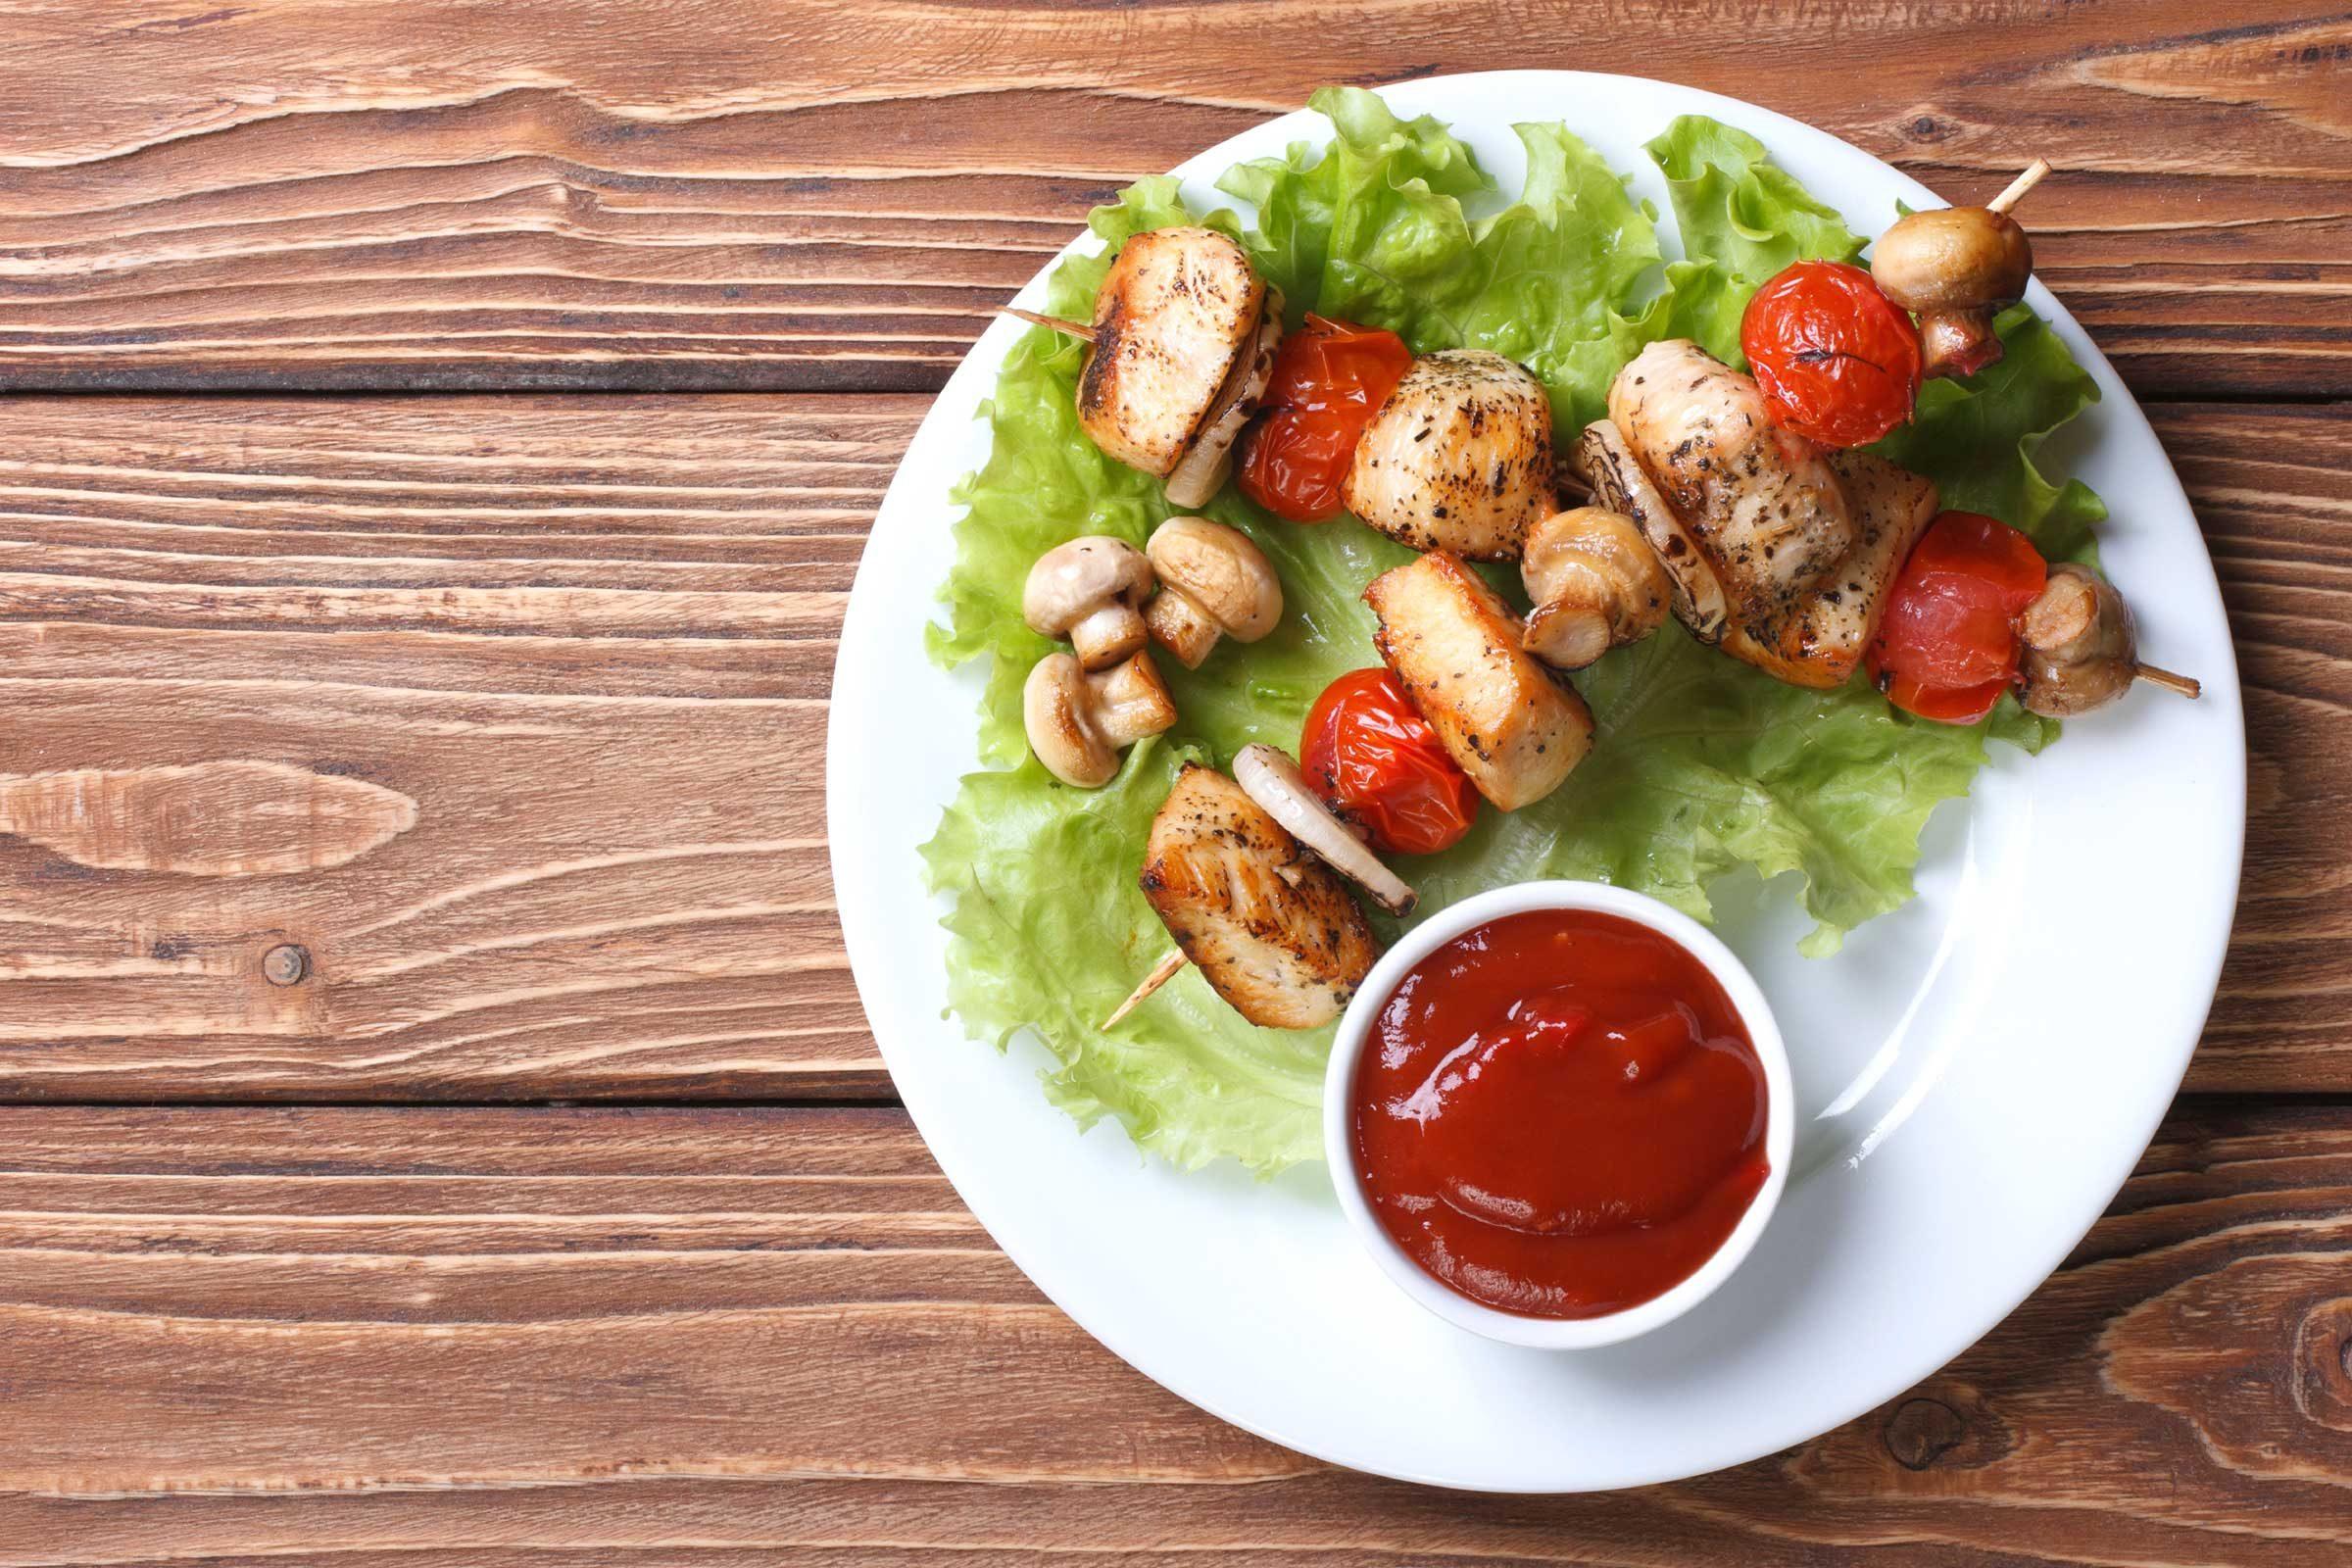 Kitchen Organization Tips For Healthier Eating